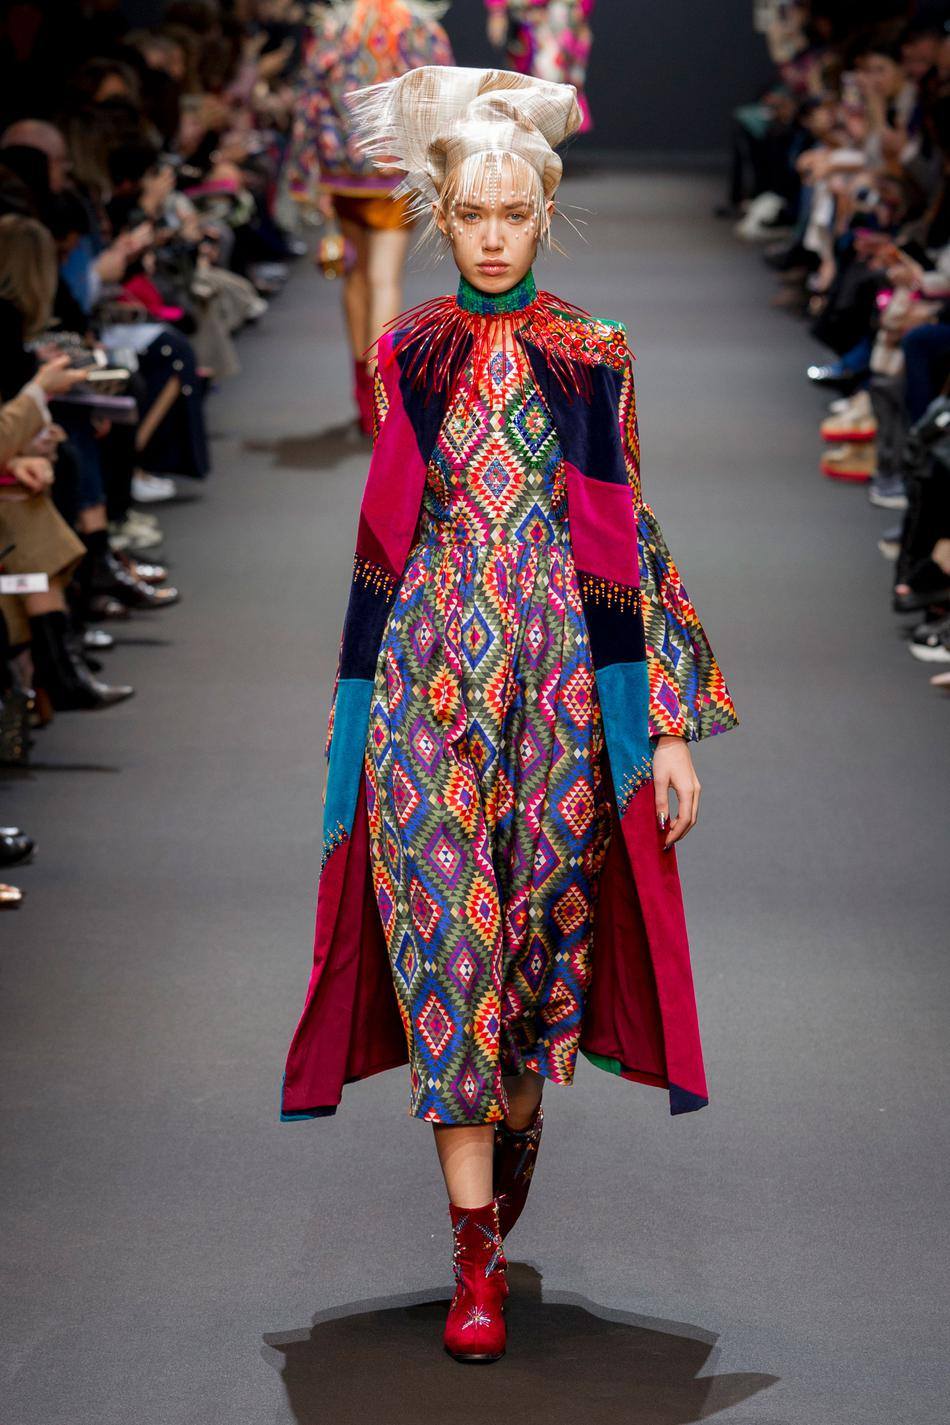 Défilé Manish Arora Fashion Week 2017 - Look 15